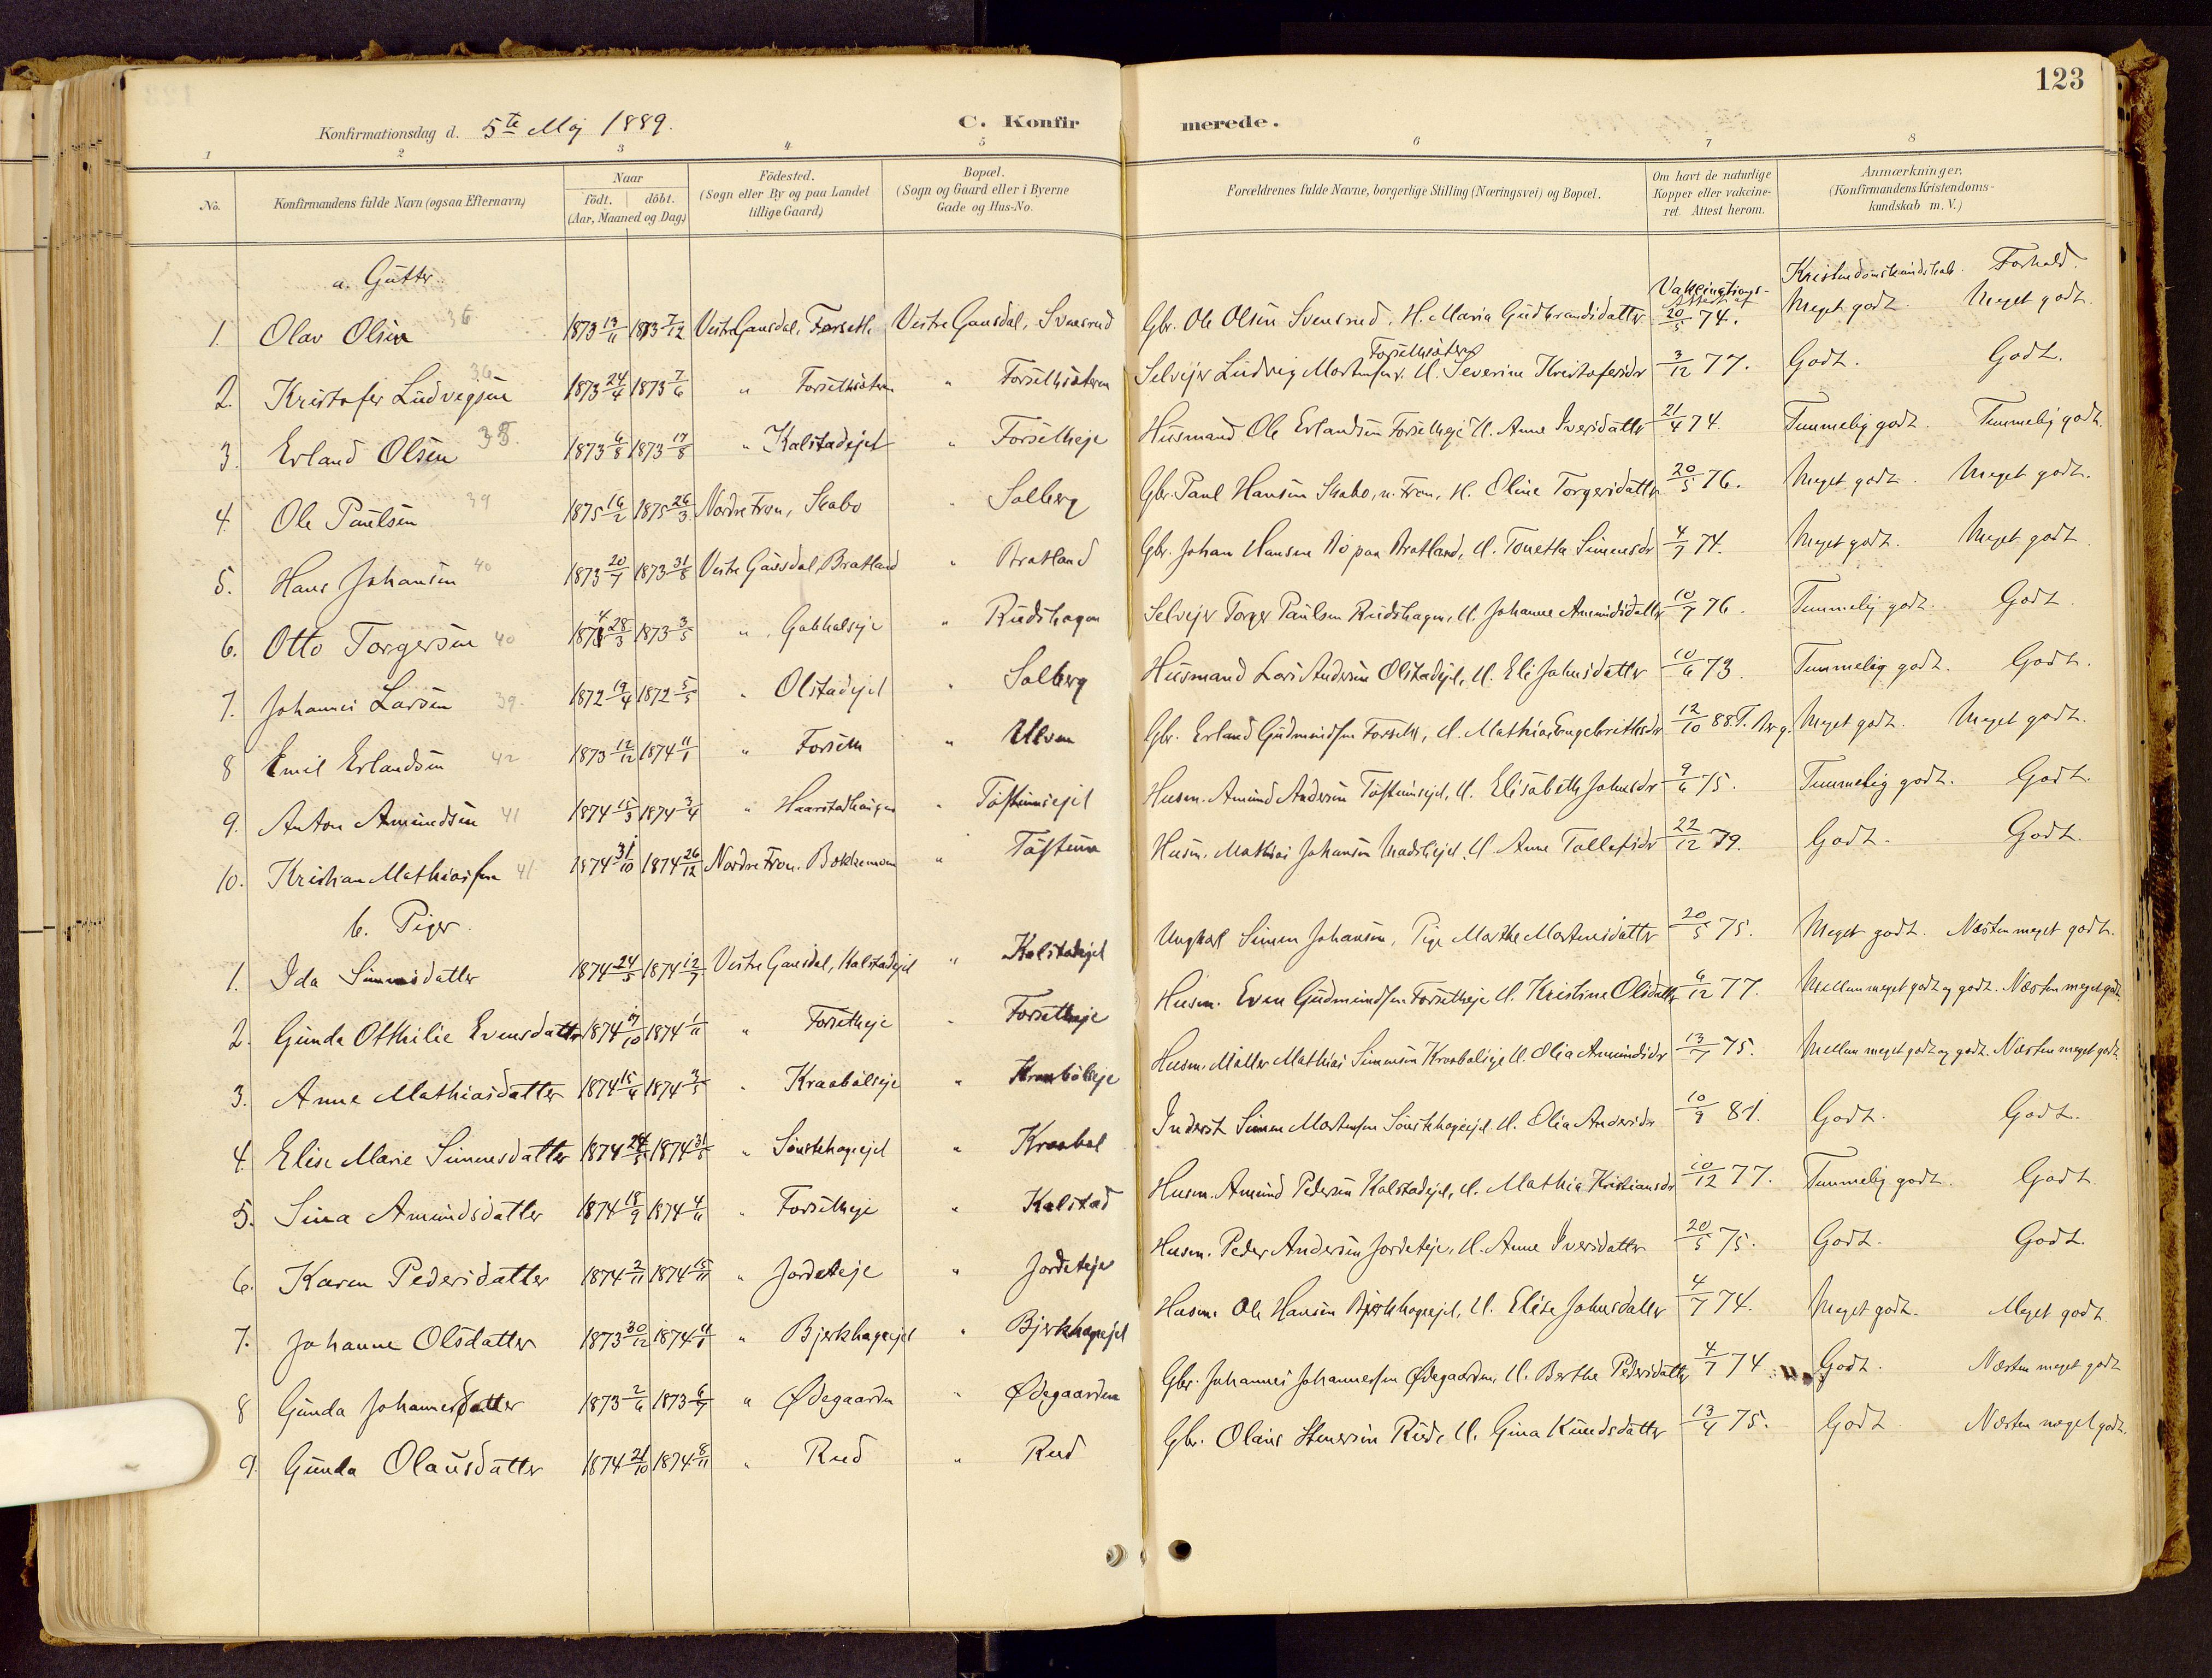 SAH, Vestre Gausdal prestekontor, Ministerialbok nr. 1, 1887-1914, s. 123